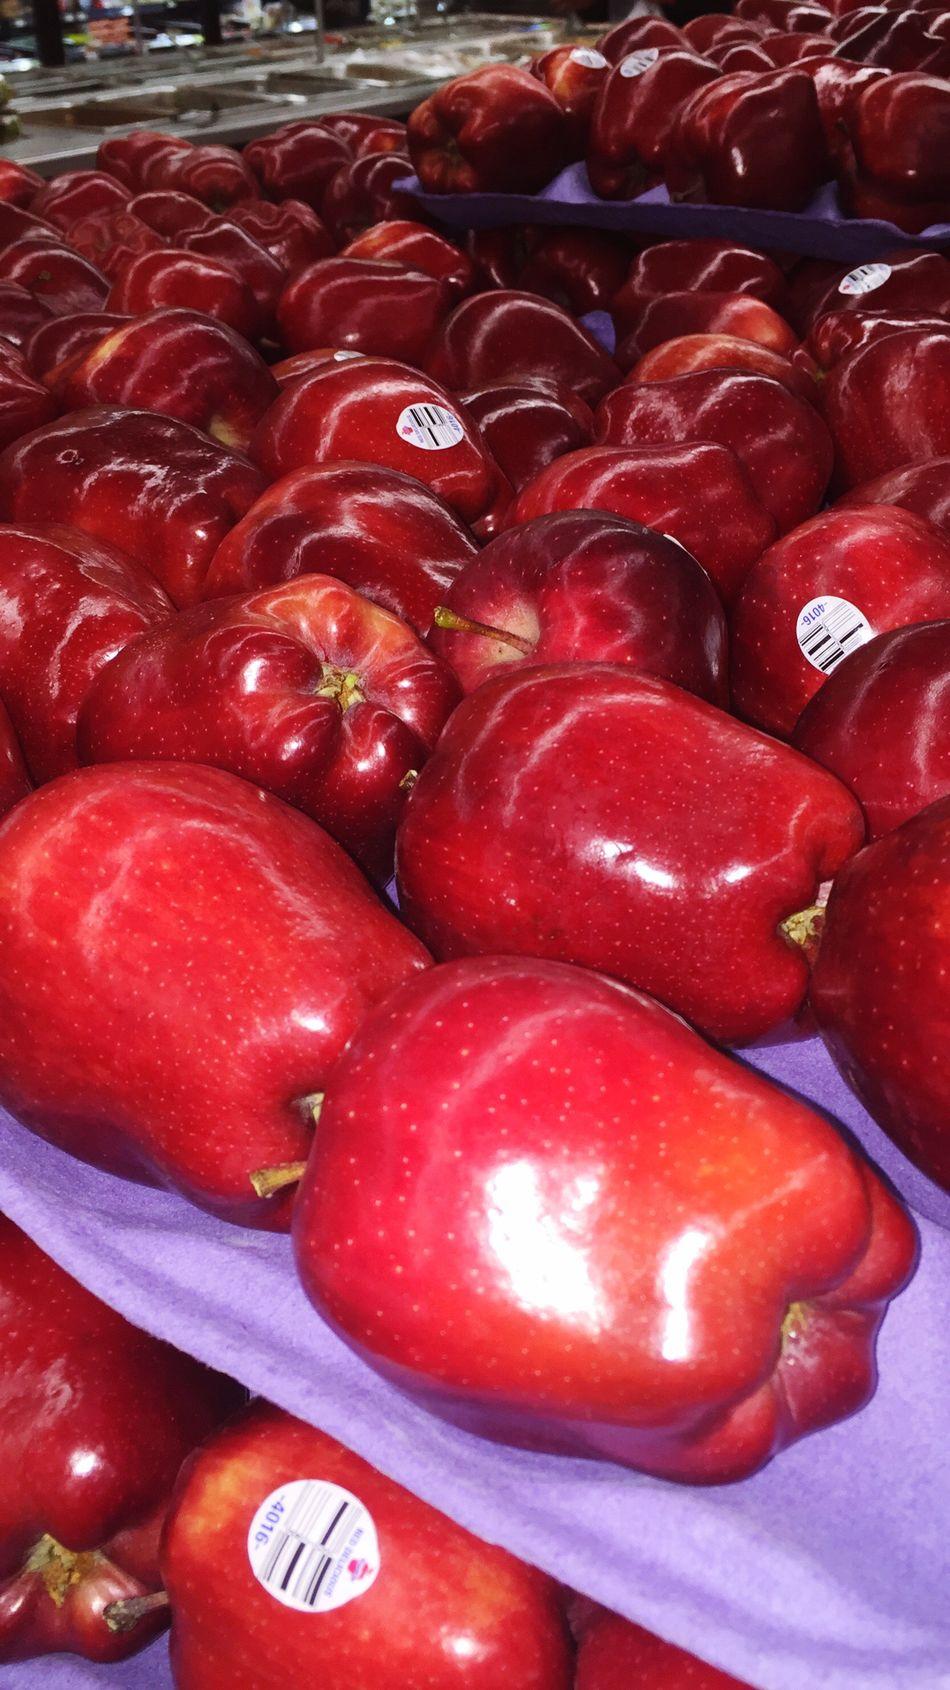 Food And Drink Red Food Freshness Healthy Eating Abundance Food And Drink Manzanas Apples Manzanas 🍎 cClose-uprRetail mMarket StallfFor SalefFull FramebBackgroundsnNo PeopledDayiIndoors fFarmer Market